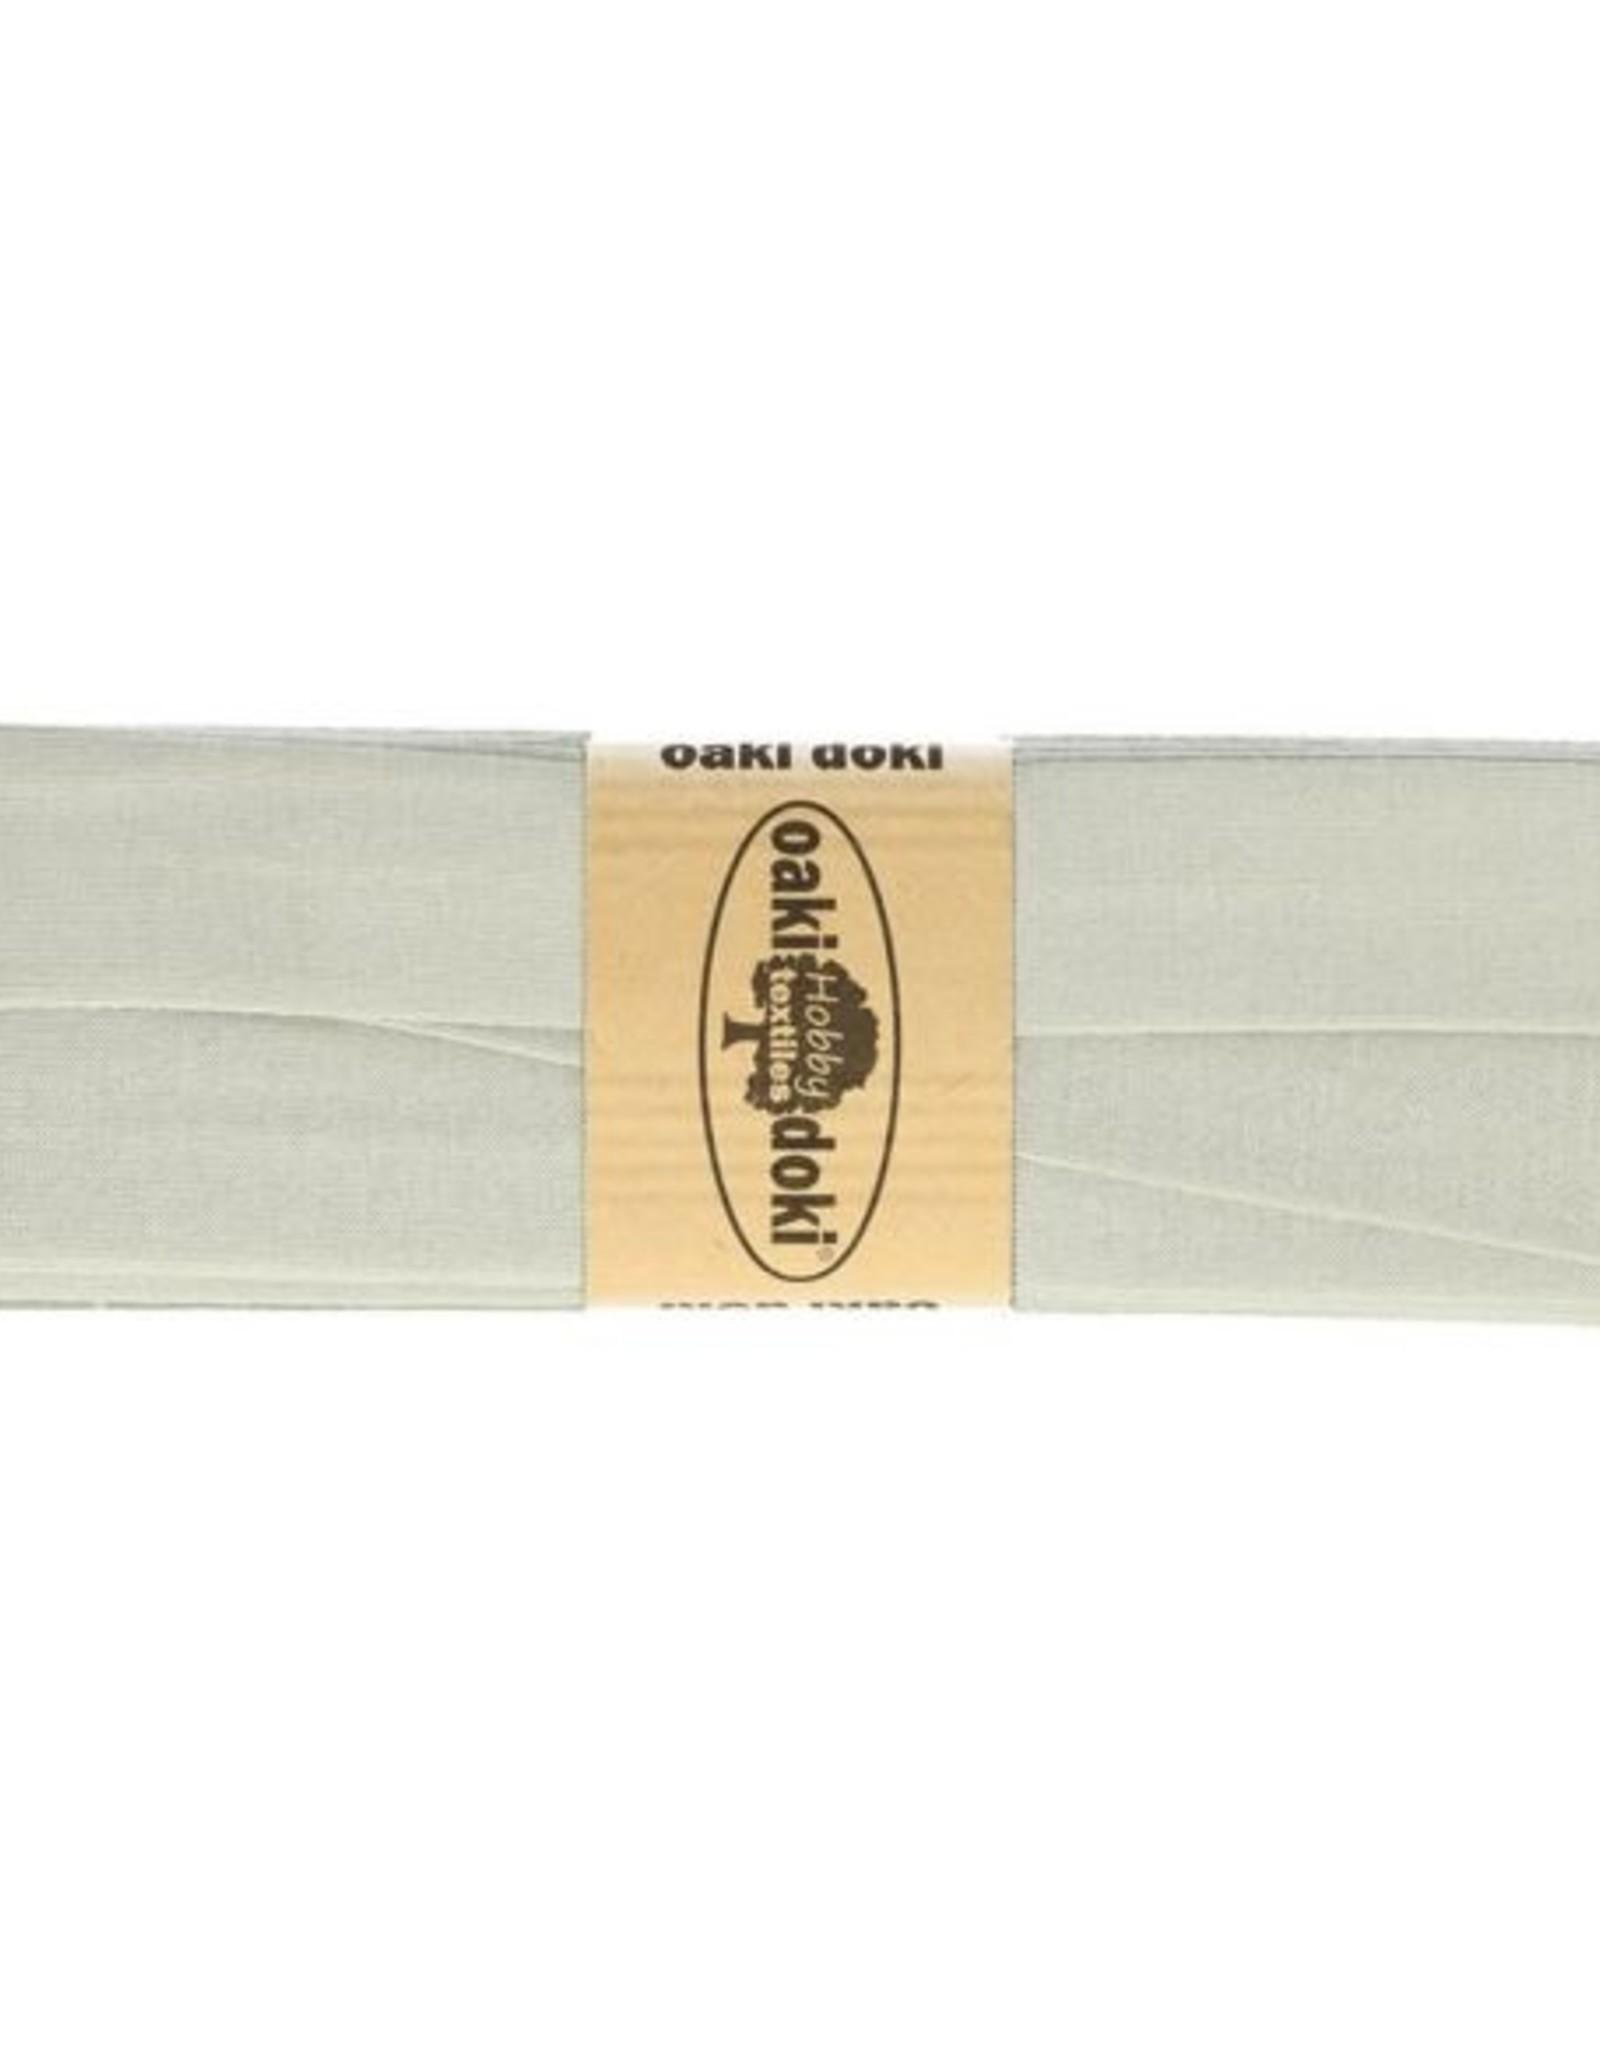 Oaki Doki Tricot de luxe jersey biaisband 20mm x 3m 052